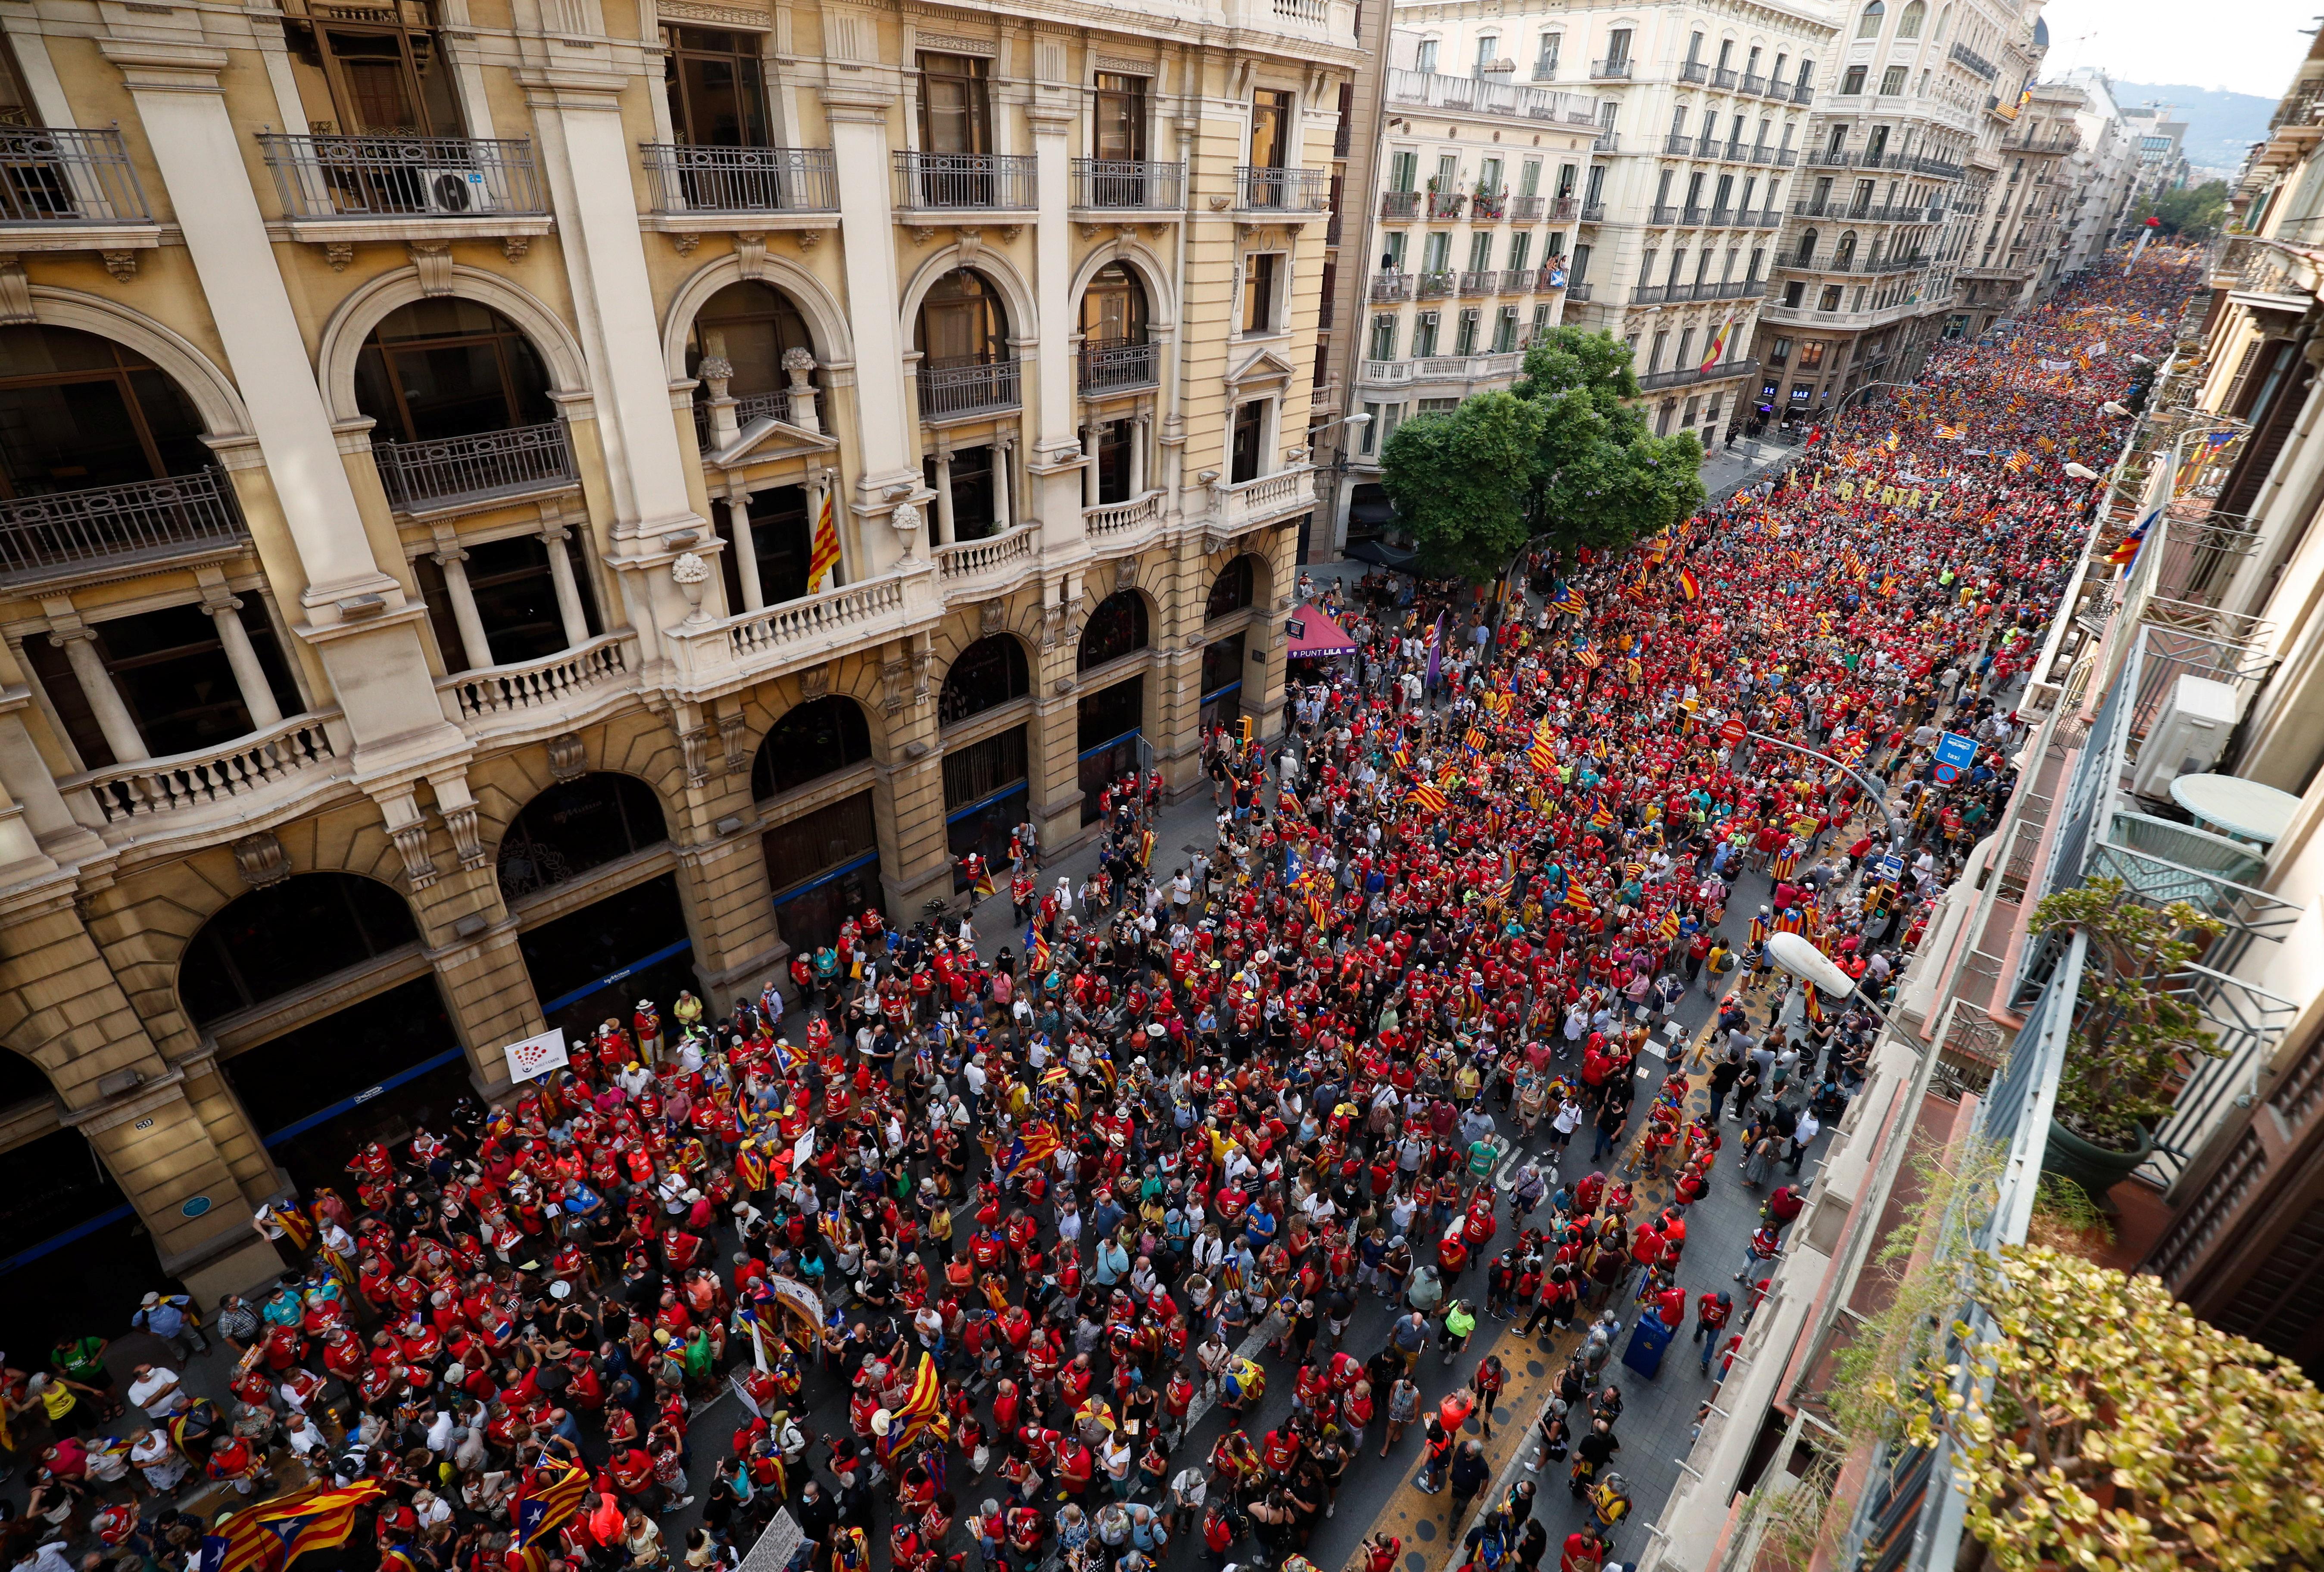 People hold up Estelada flags (Catalan separatist flag) during Catalonia's national day, 'La Diada', in Barcelona, Spain, September 11, 2021. REUTERS/ Albert Gea